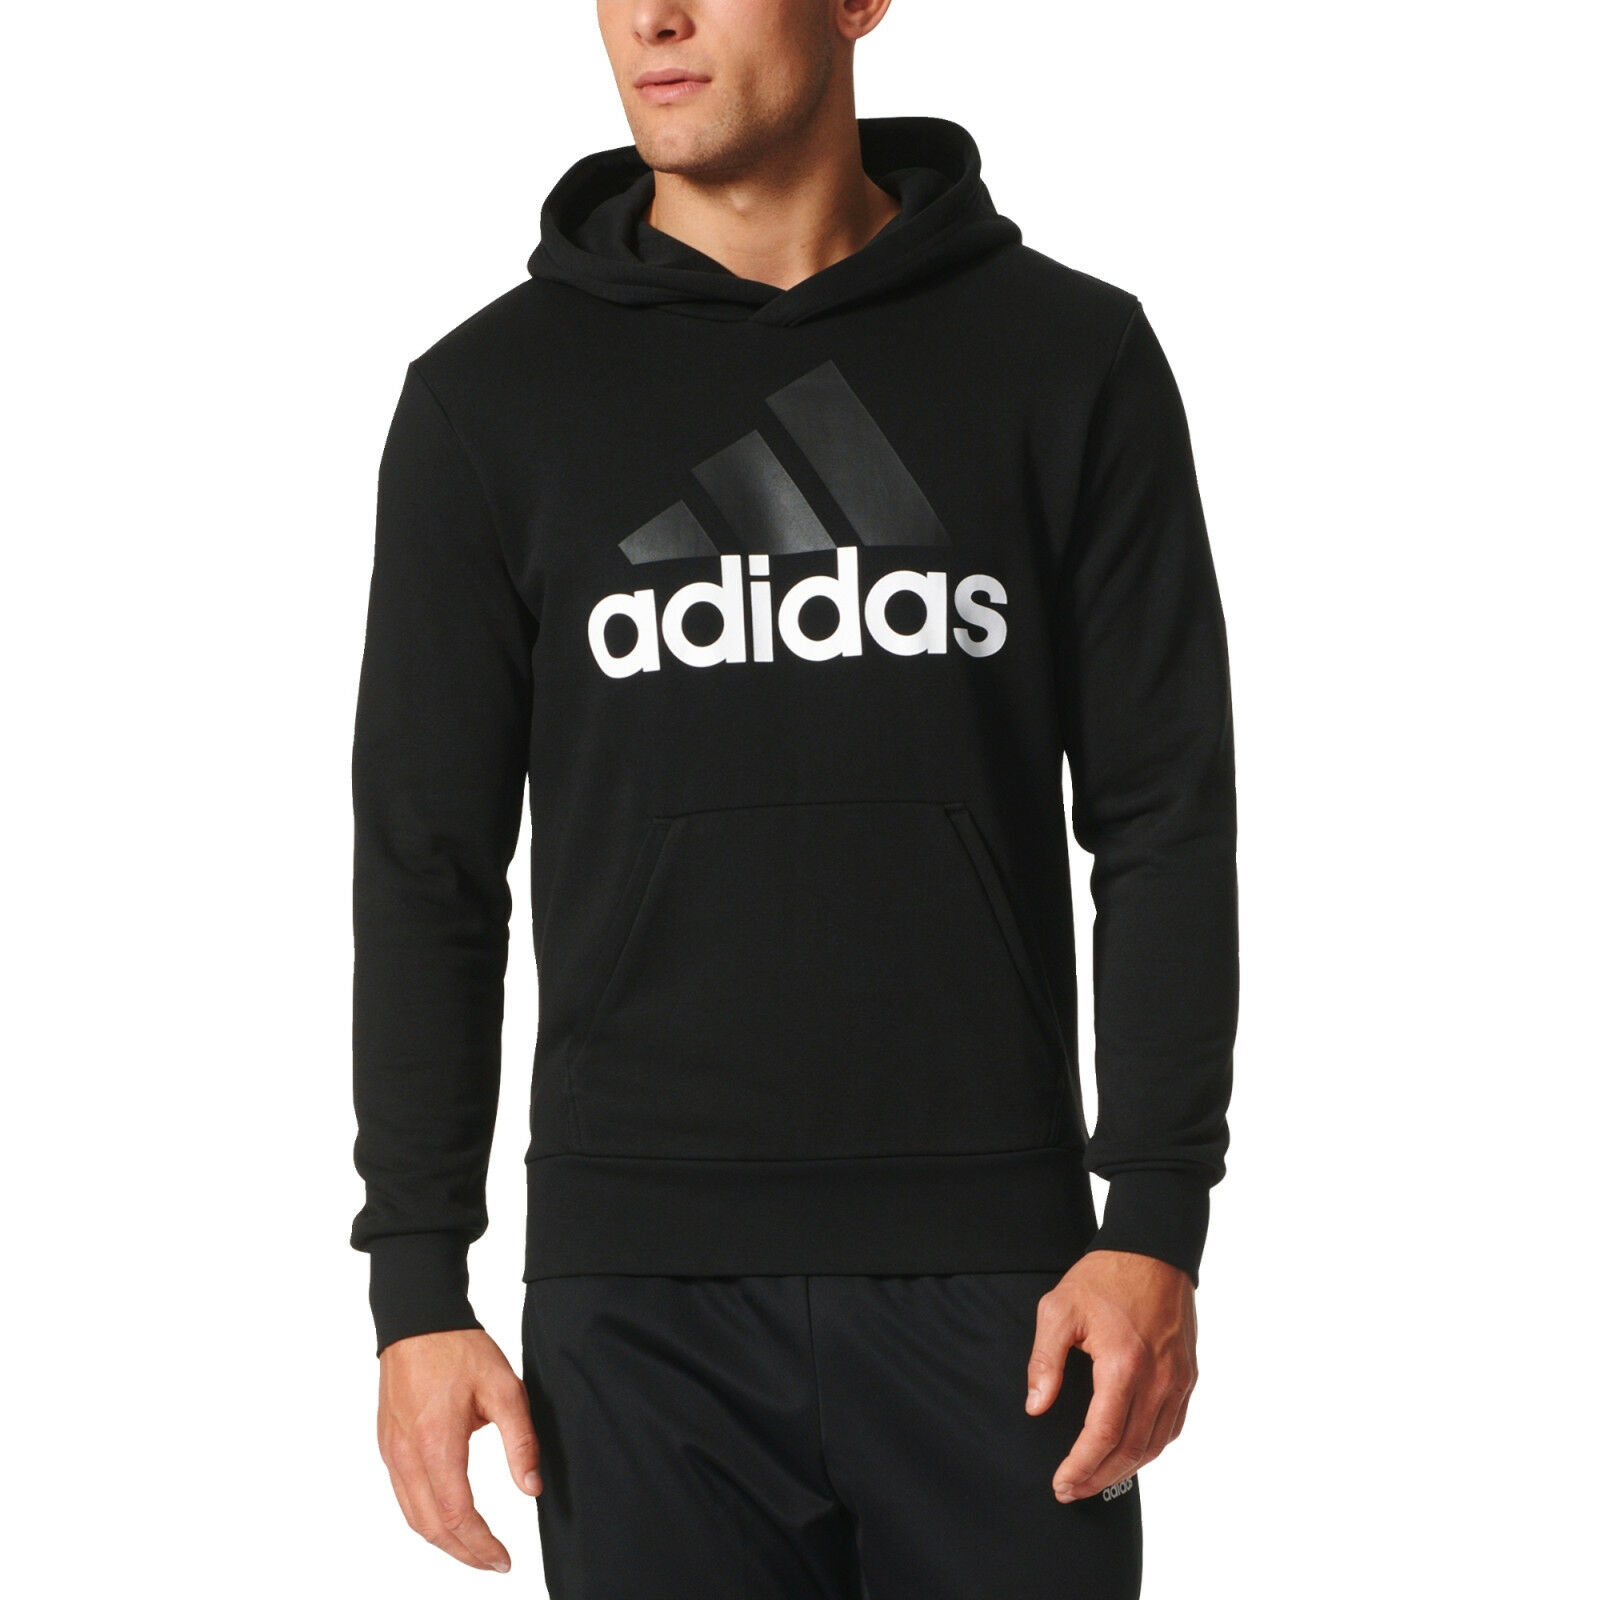 Adidas Herren Kapuzenpulli Trainieren Essentials Linear